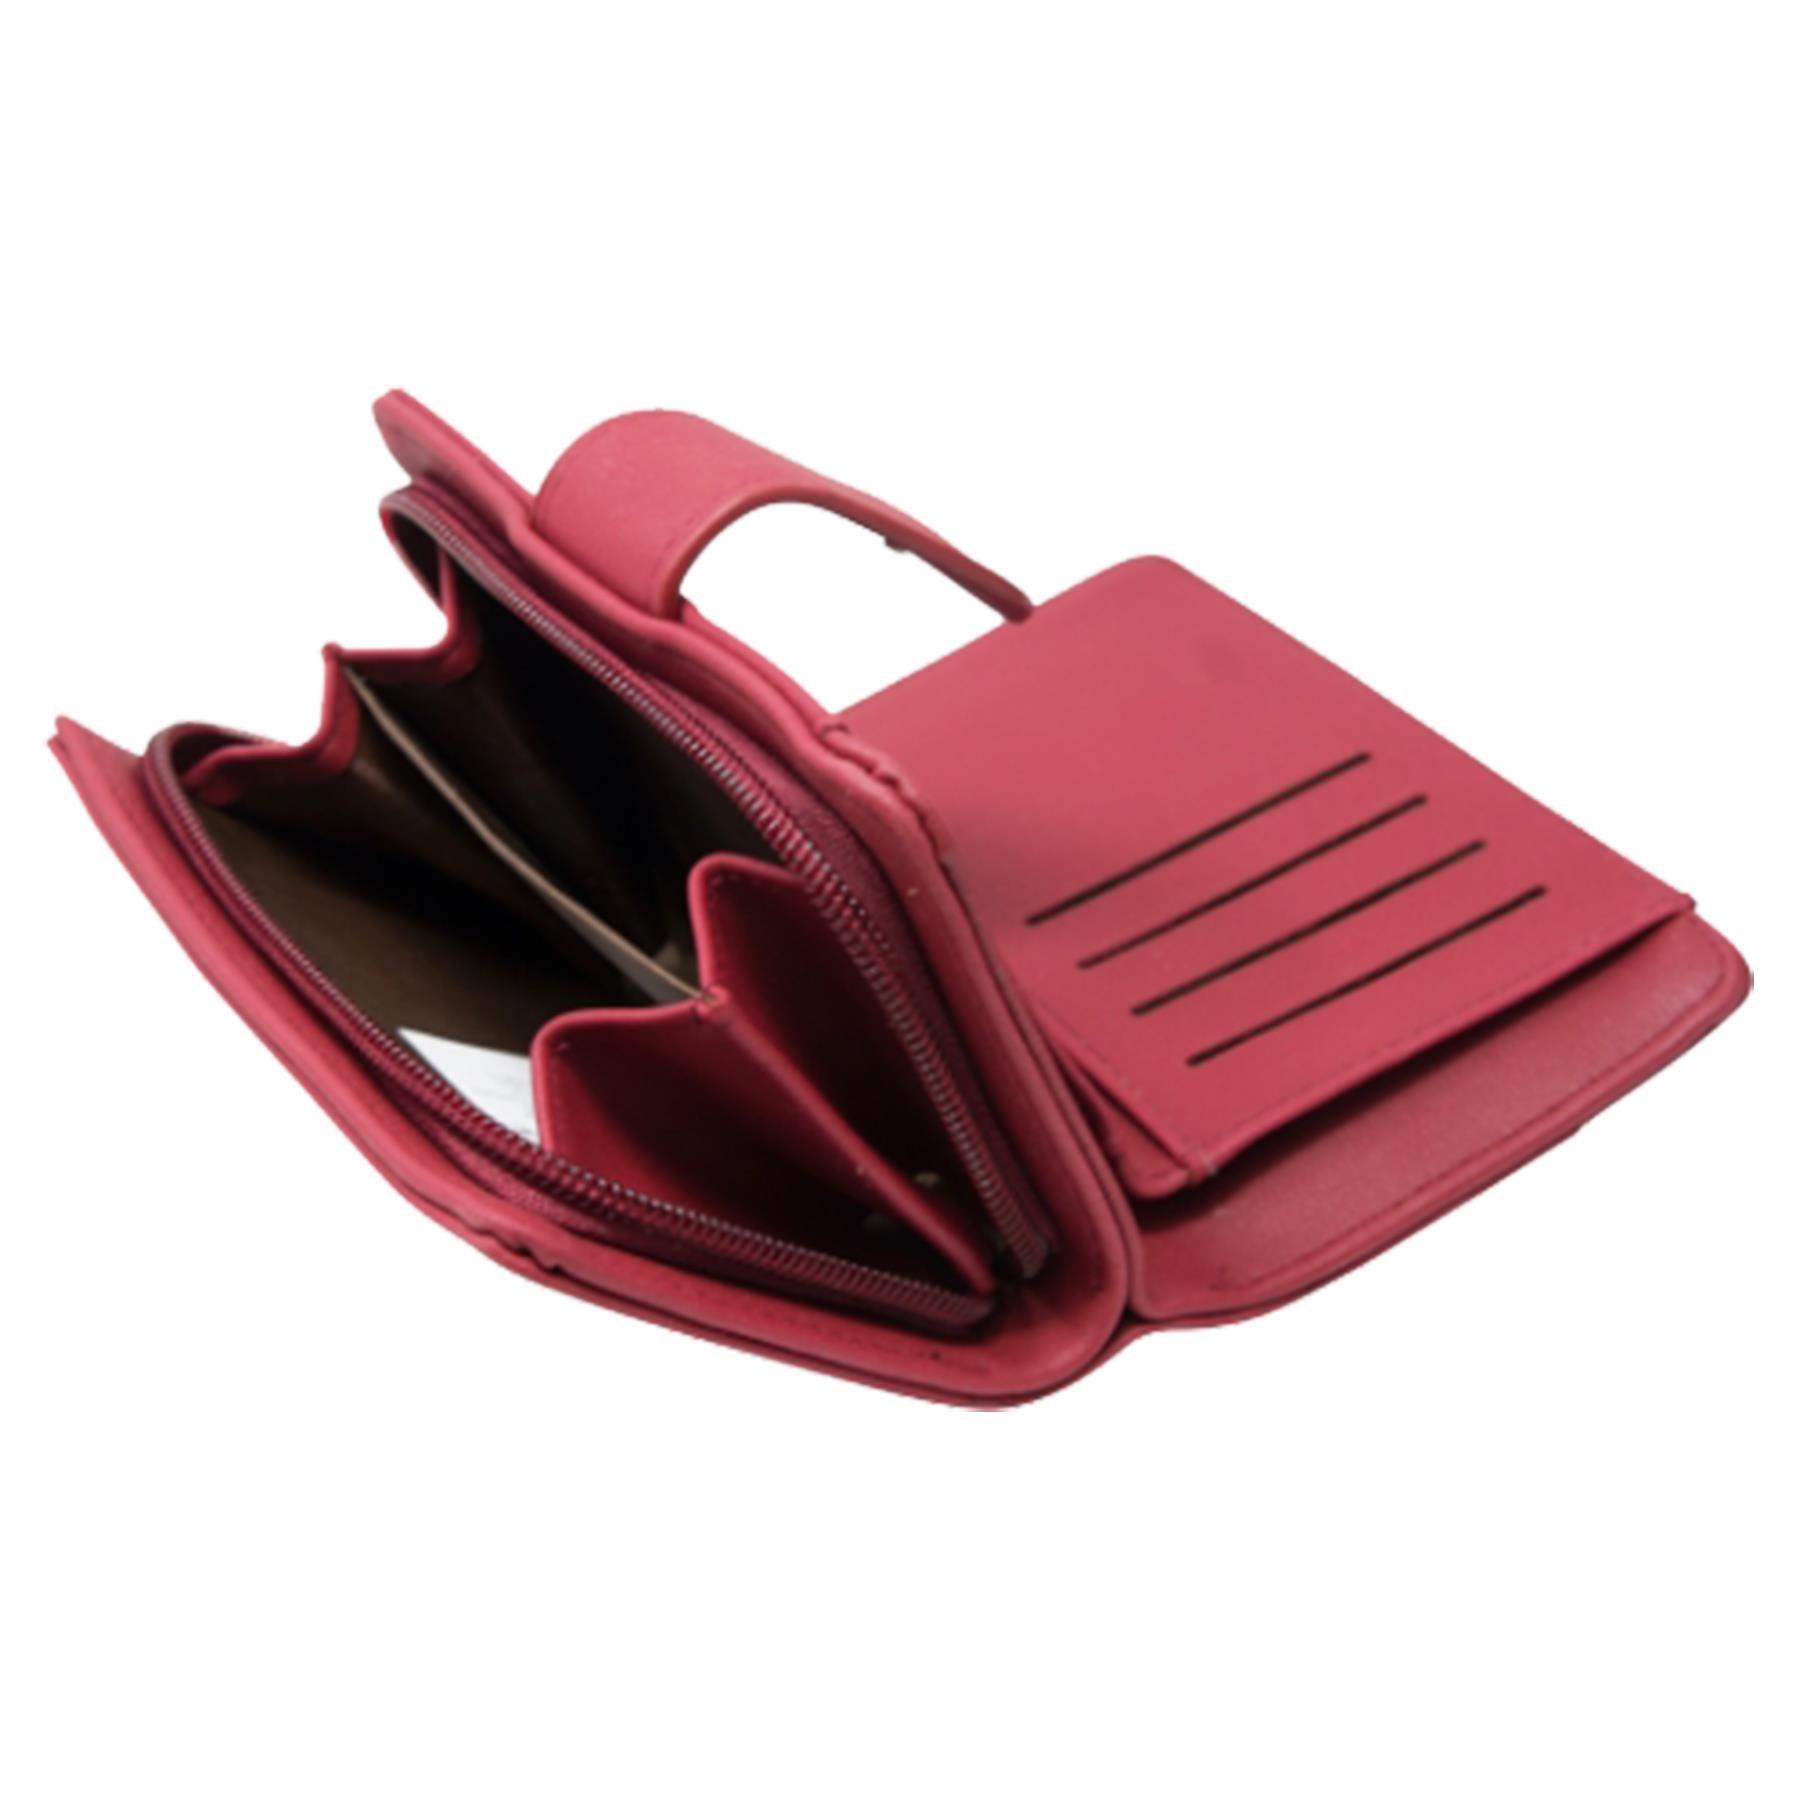 New-Ladies-Card-Slots-Zipped-Pocket-Faux-Leather-Basic-Wallet-Purse thumbnail 20